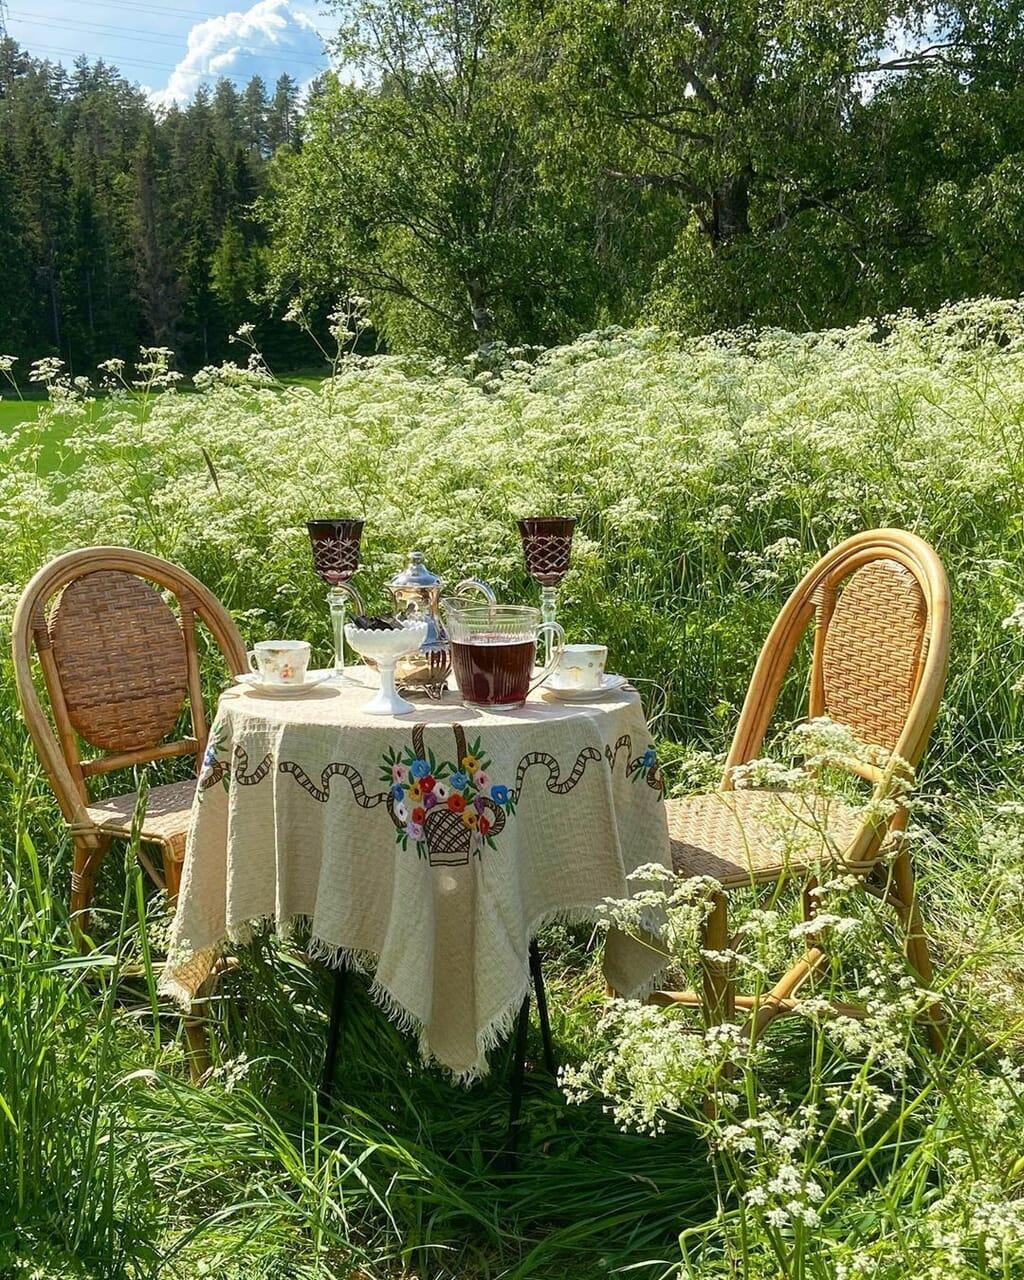 nature and cottagecore image